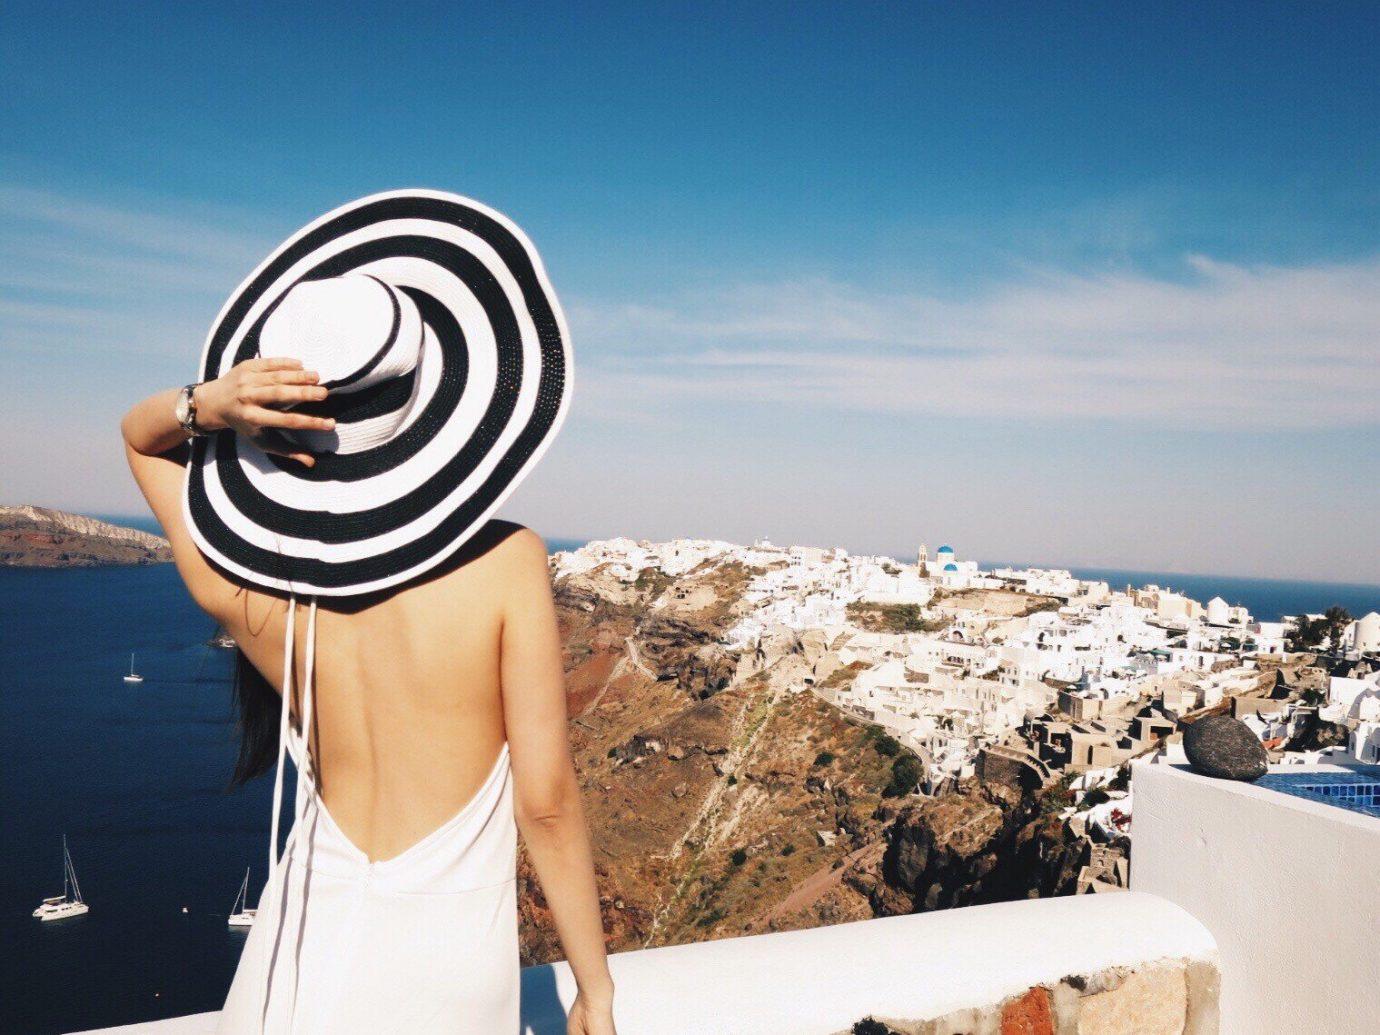 Cruise Travel Style + Design Trip Ideas sky person outdoor blue woman vacation spring Sea photo shoot posing